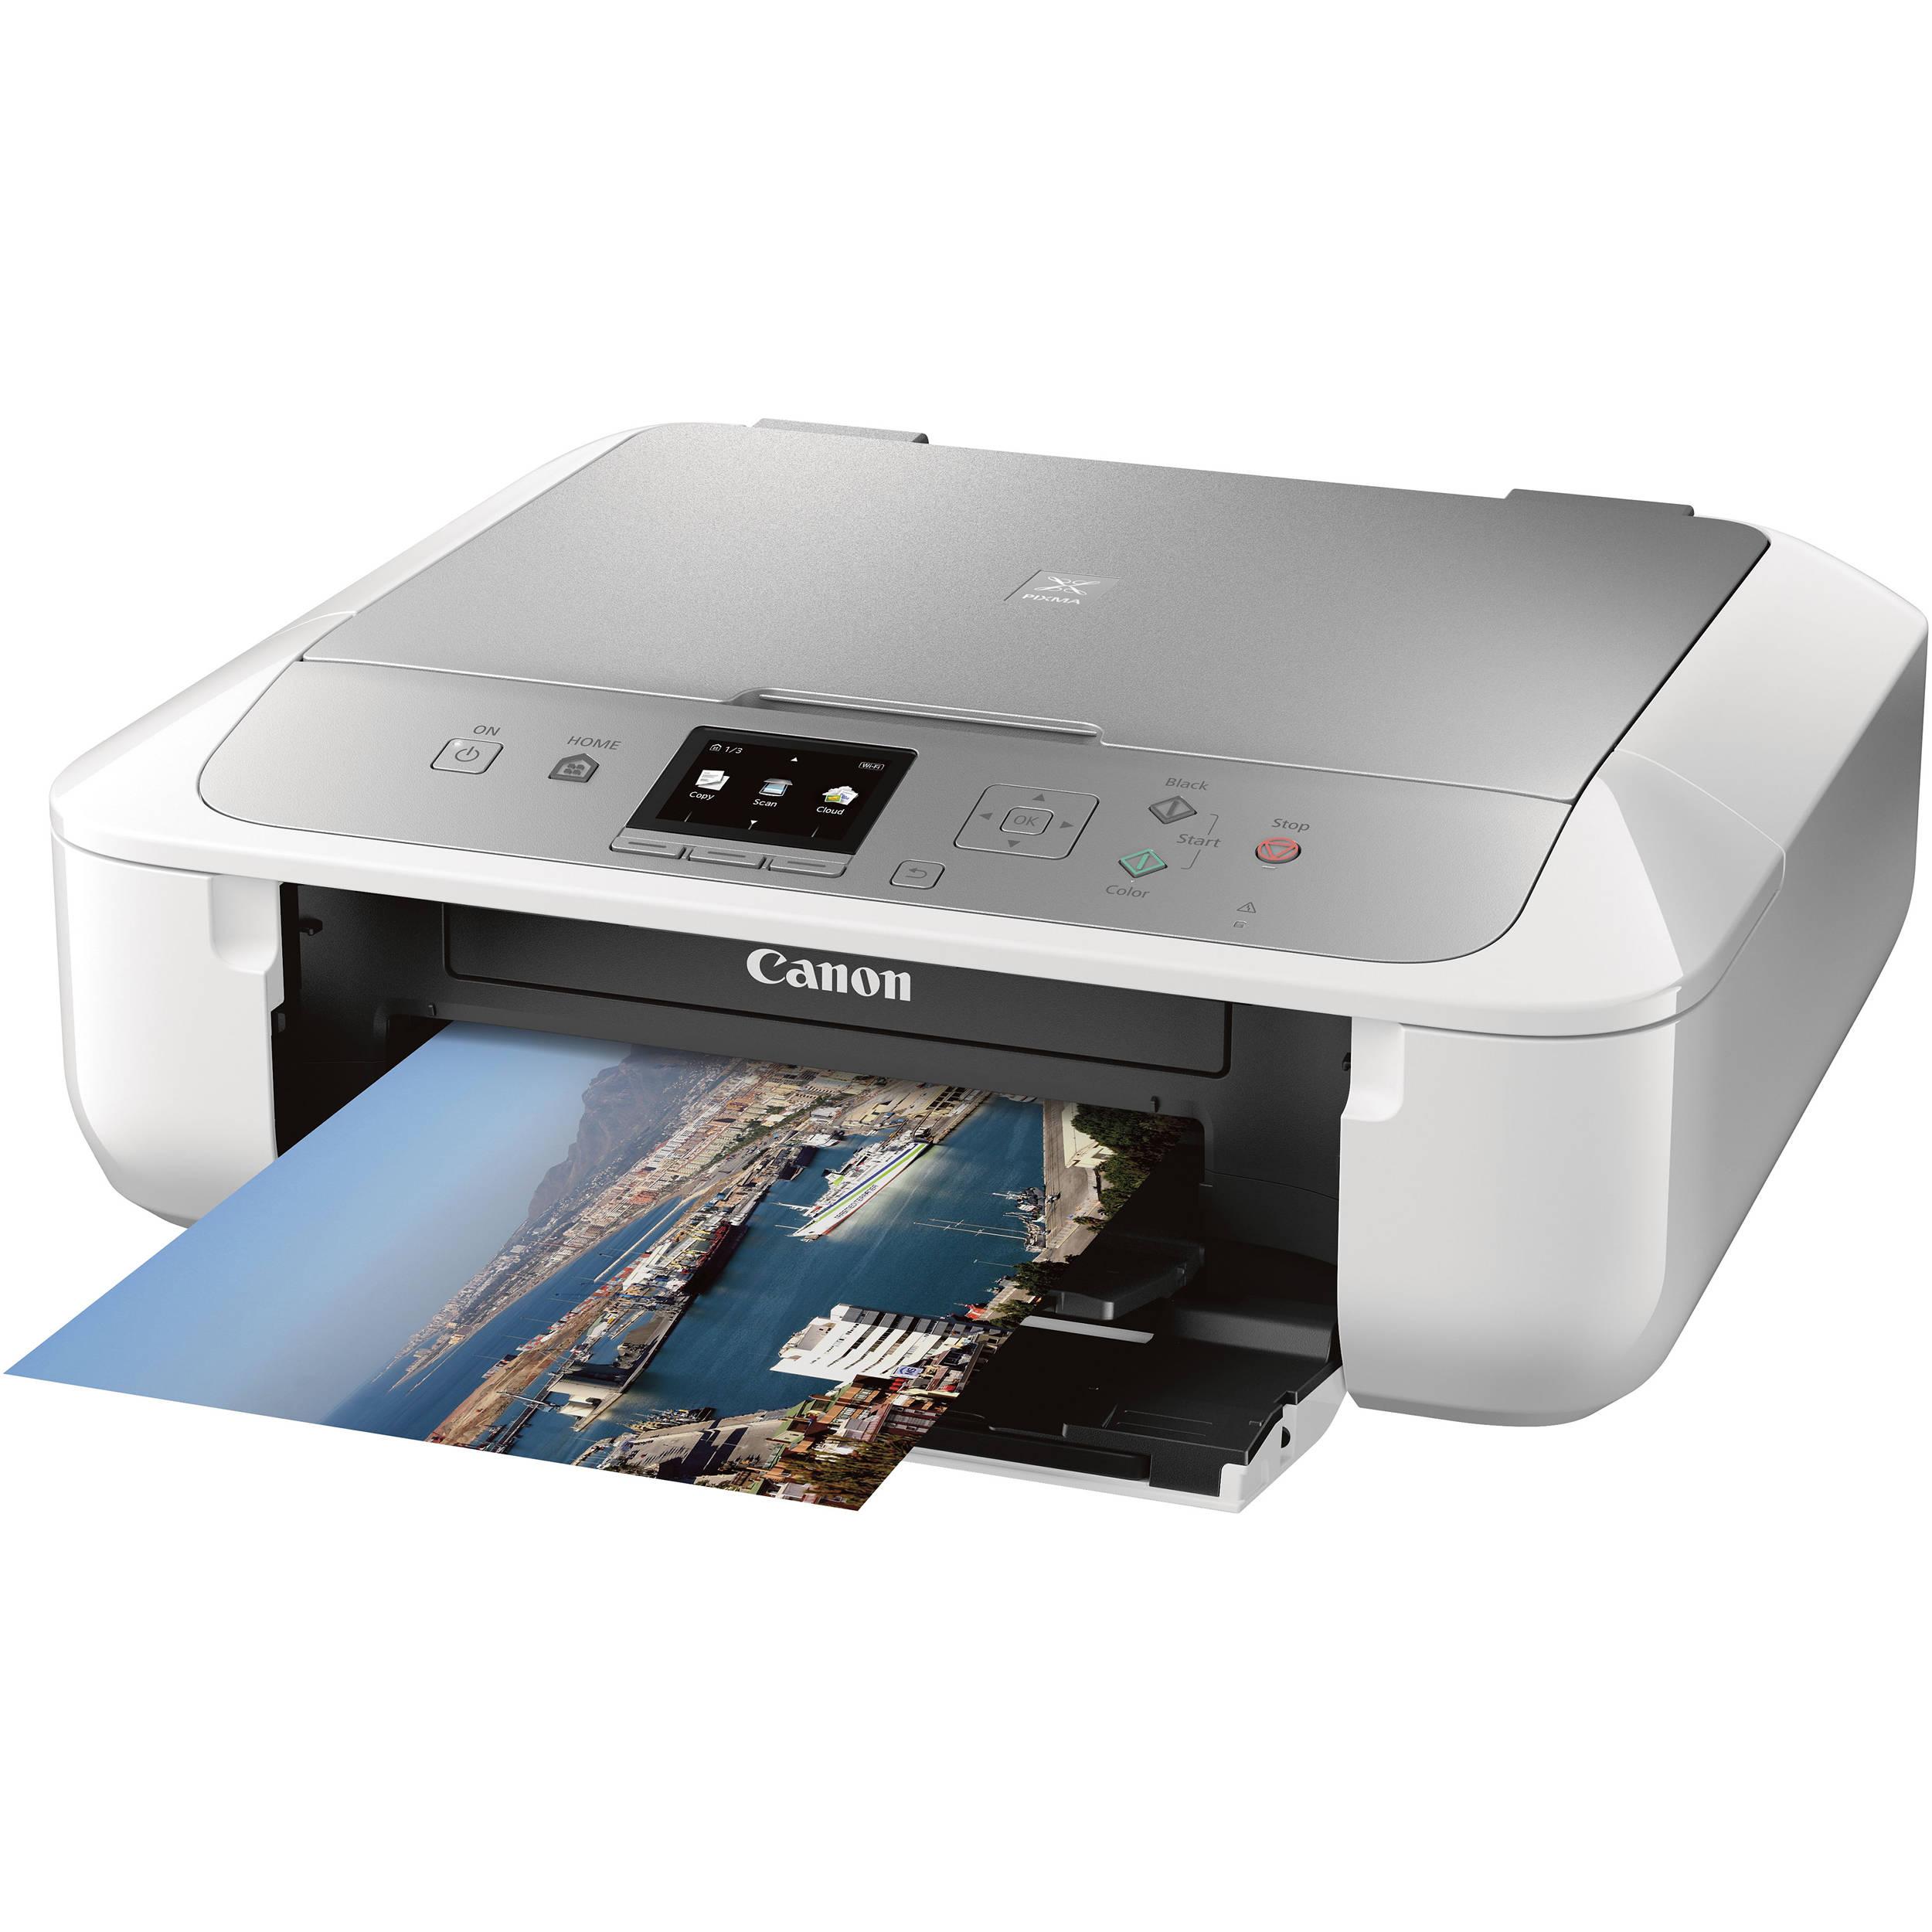 canon pixma mg5722 wireless all in one inkjet printer. Black Bedroom Furniture Sets. Home Design Ideas